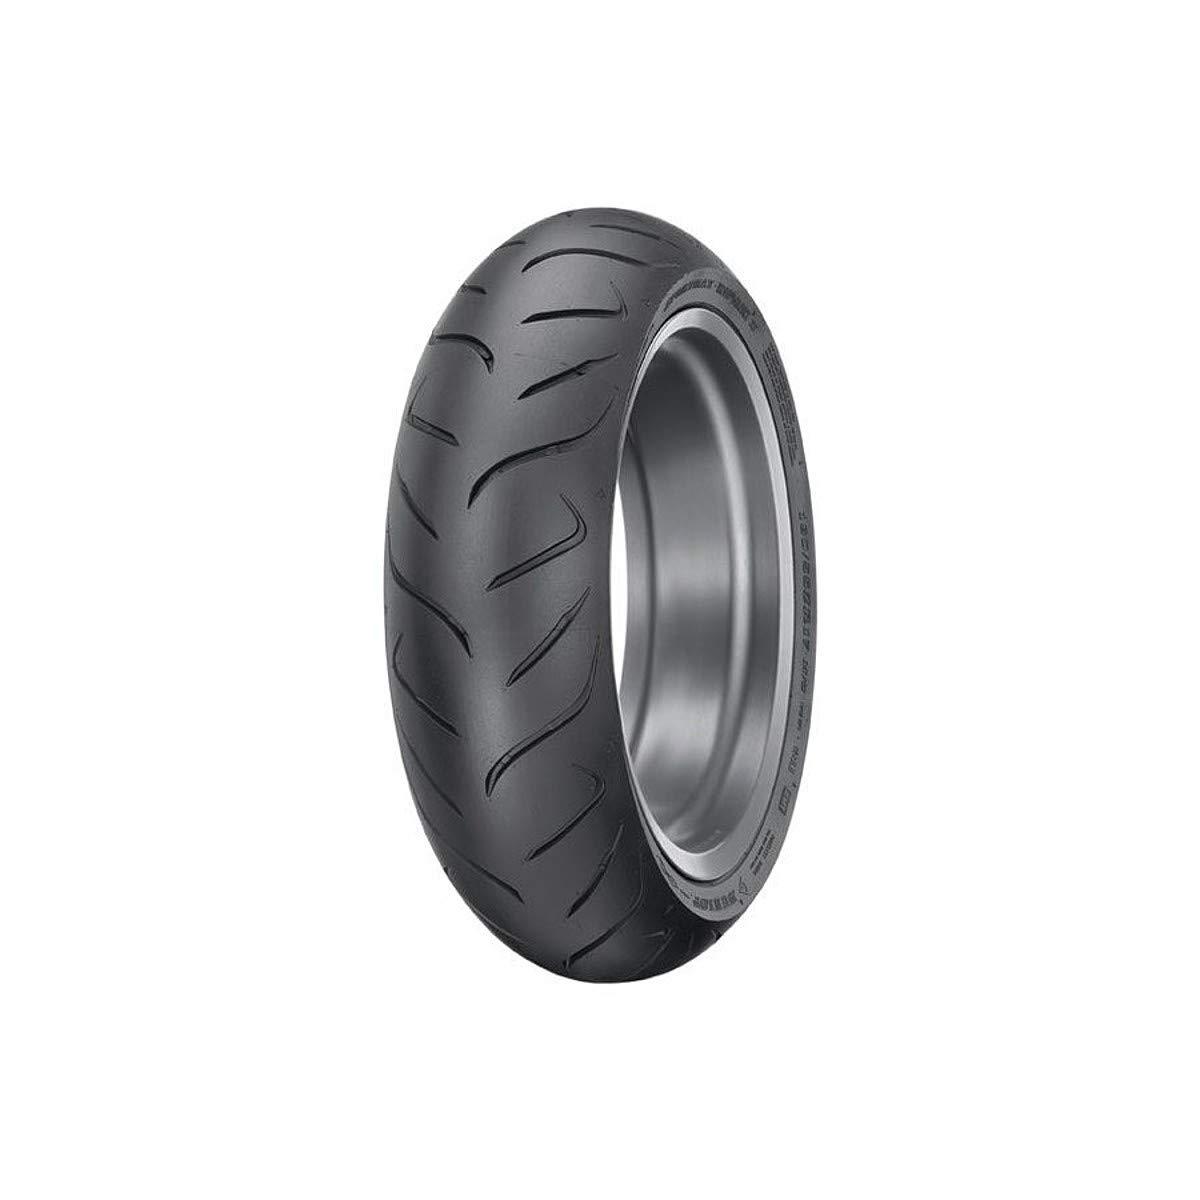 RoadSmart Dunlop